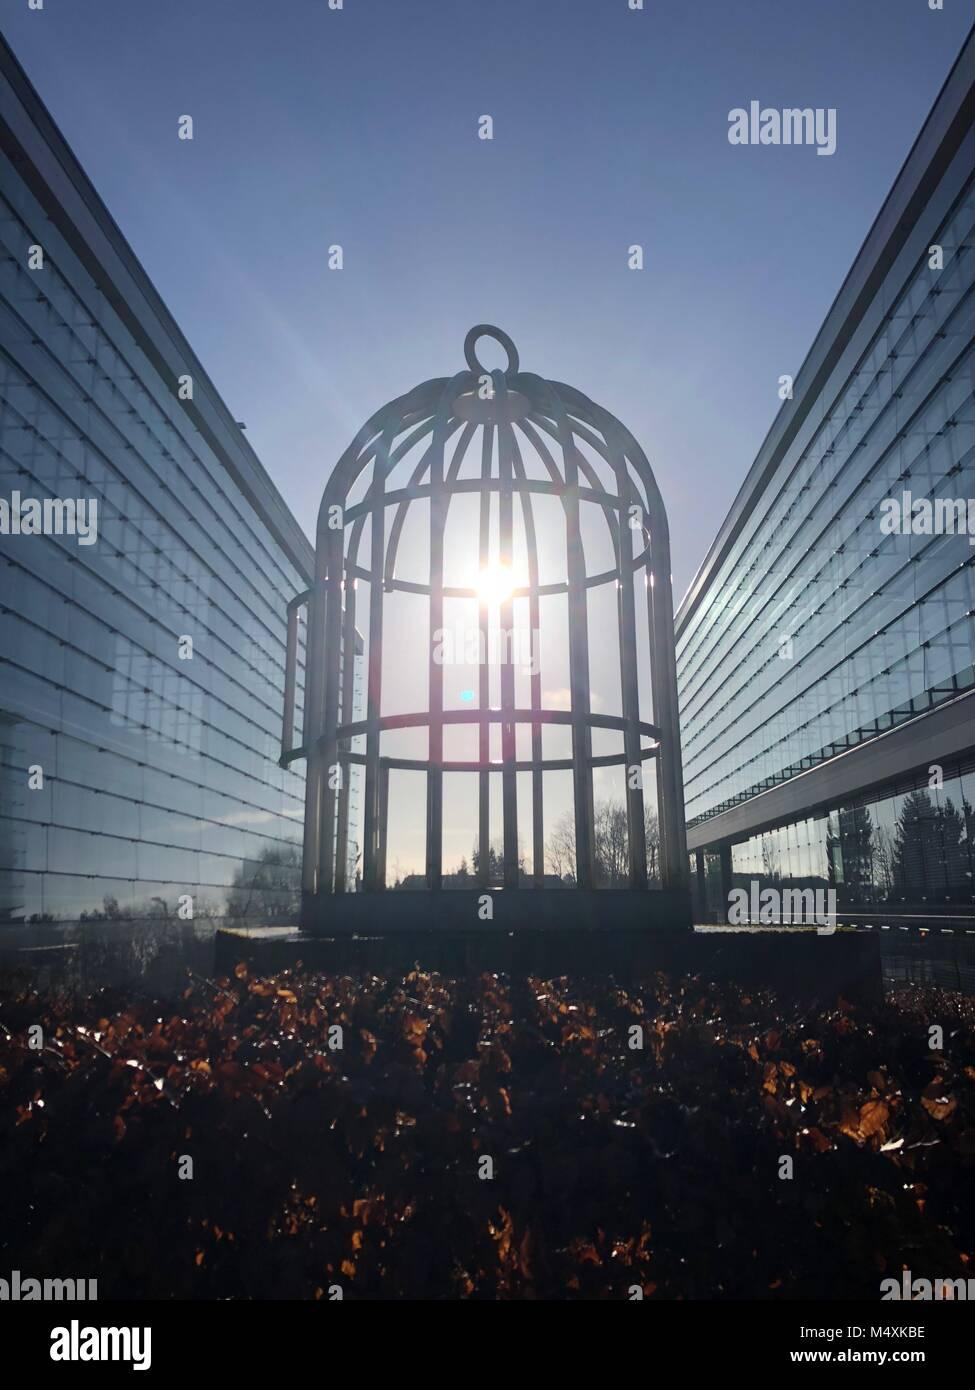 Locked In Cage Stockfotos & Locked In Cage Bilder - Alamy